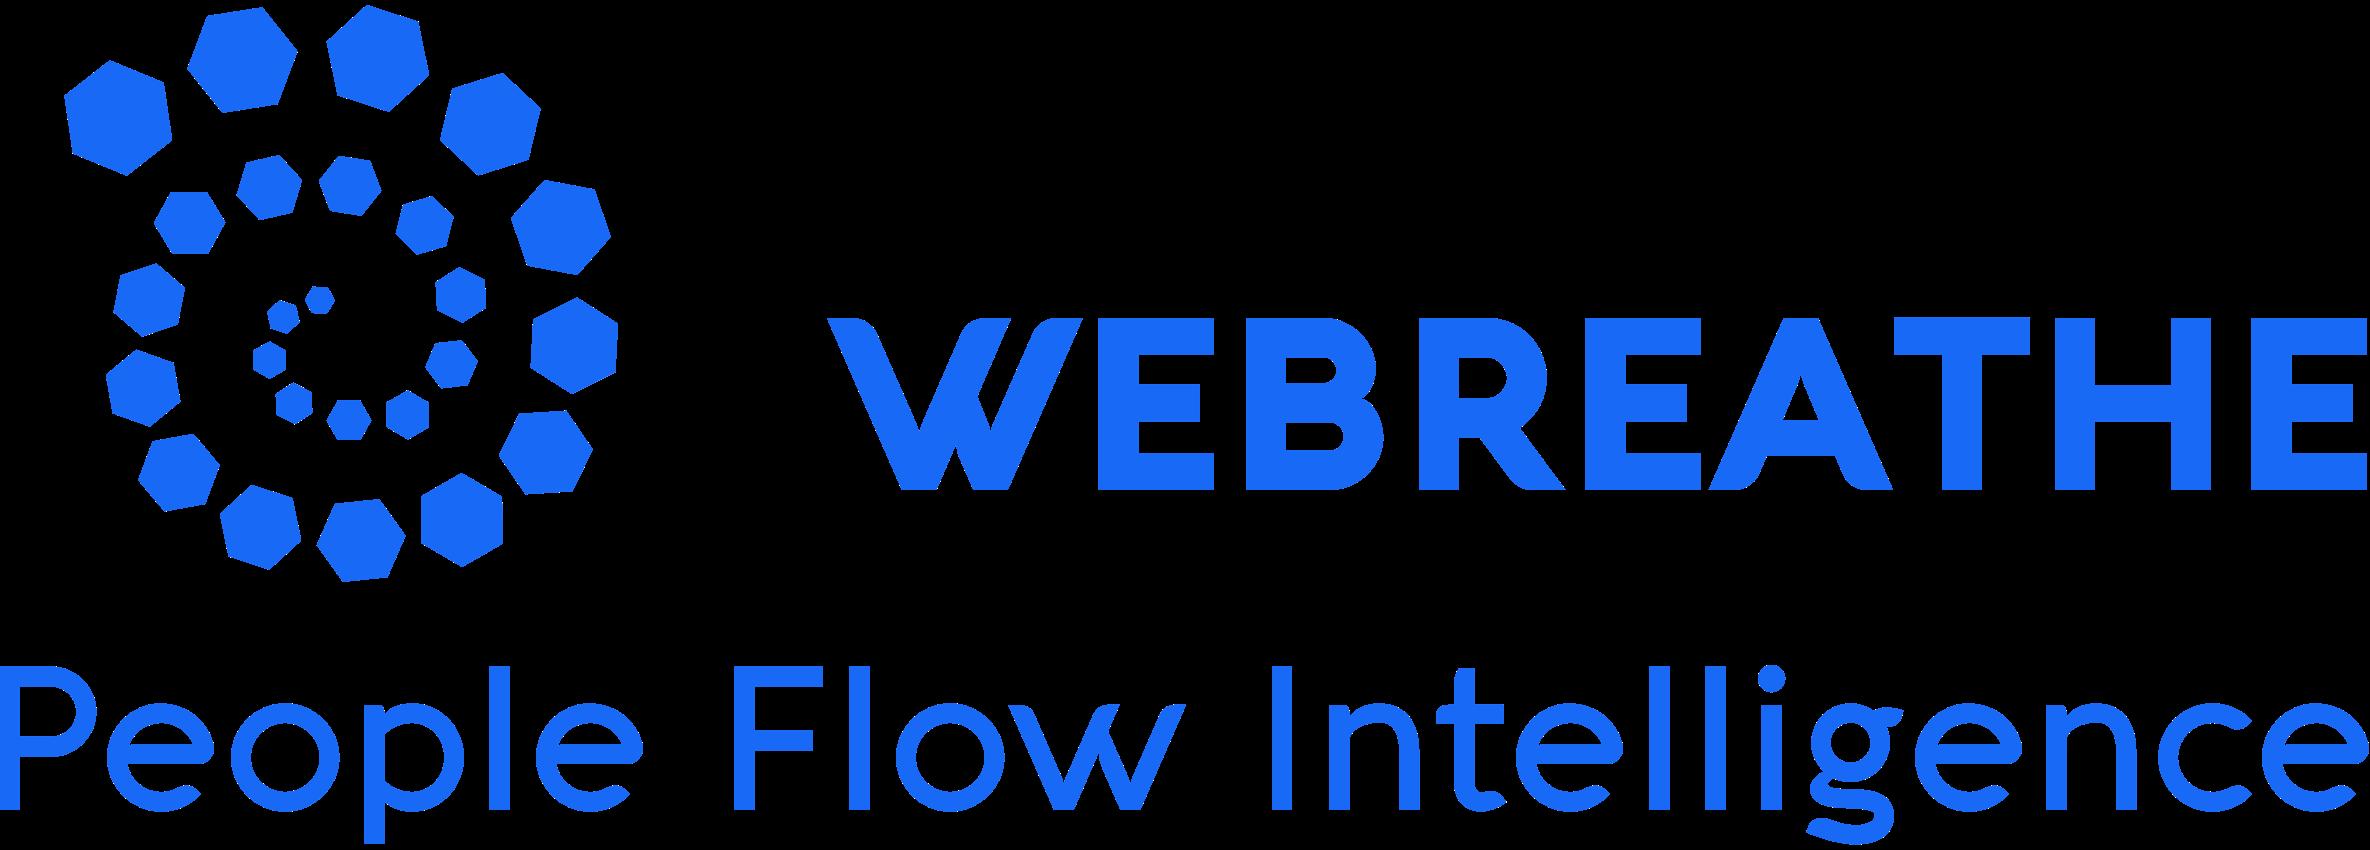 webreath-logo